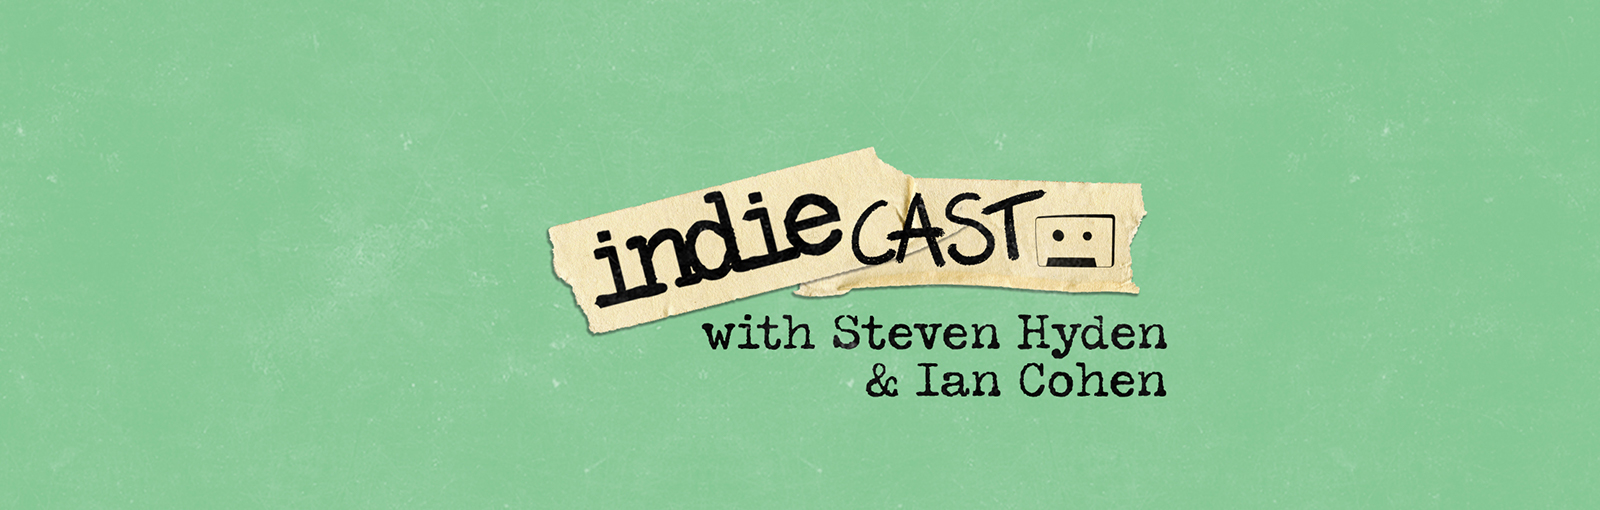 Indiecast-t-feat.jpg